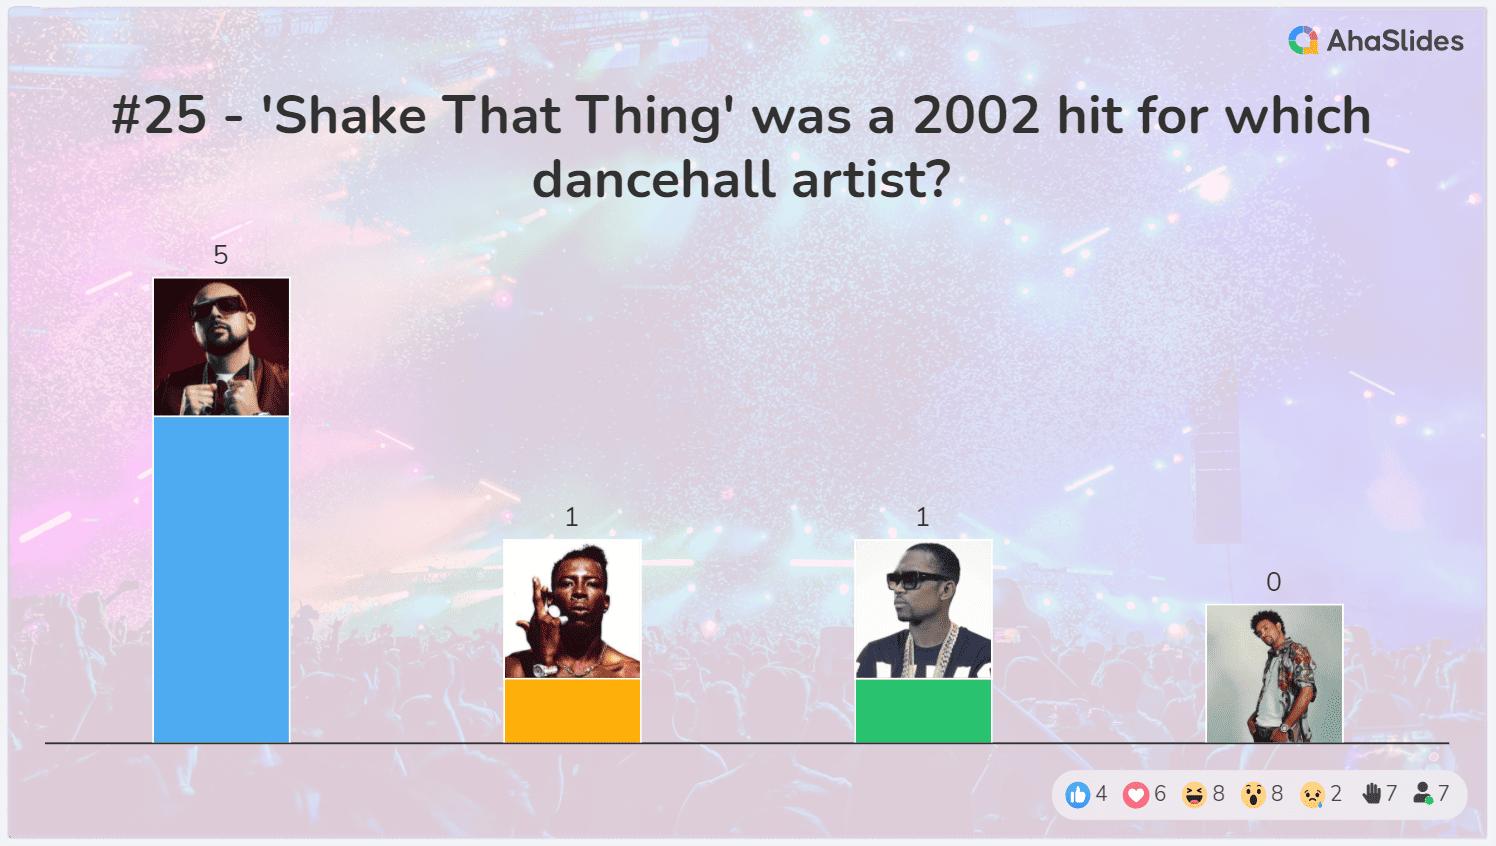 Pop music images live quiz template on AhaSlides